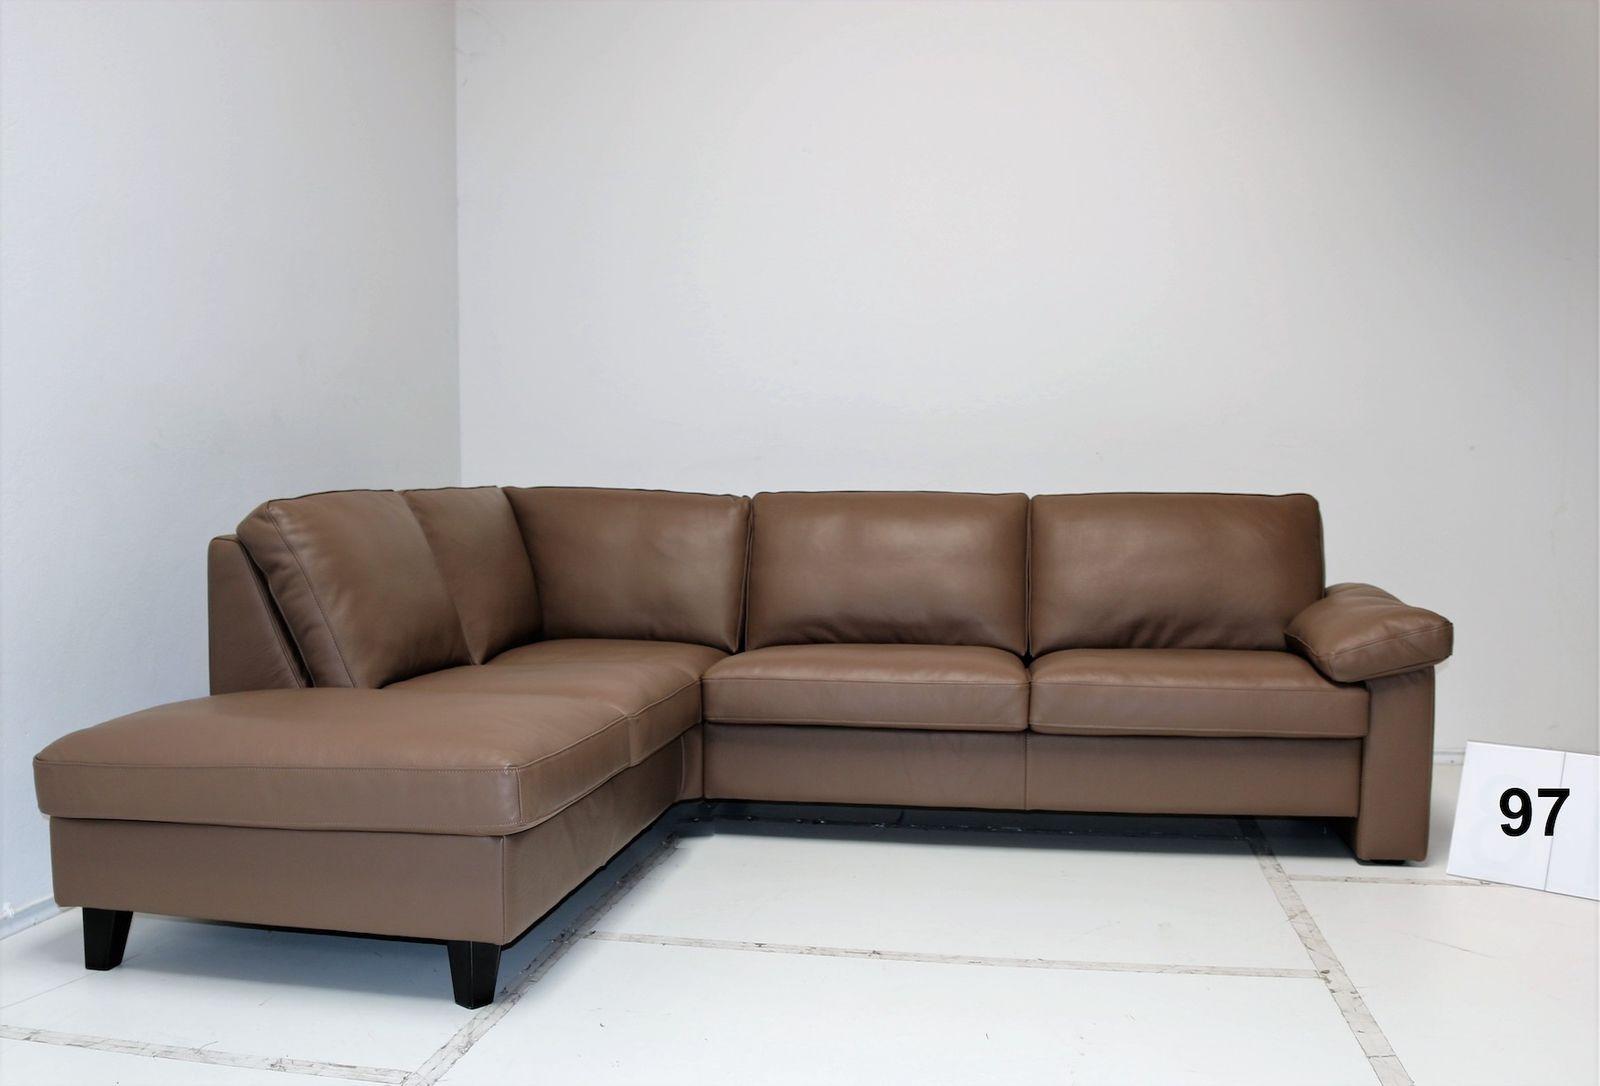 Full Size of Sofa 2 5 Sitzer Leder Mit Relaxfunktion Elektrisch Marilyn Couch Stoff Federkern Microfaser Schlaffunktion Landhausstil Grau Fotomodell Lederecksofa Concept Sofa Sofa 2 5 Sitzer